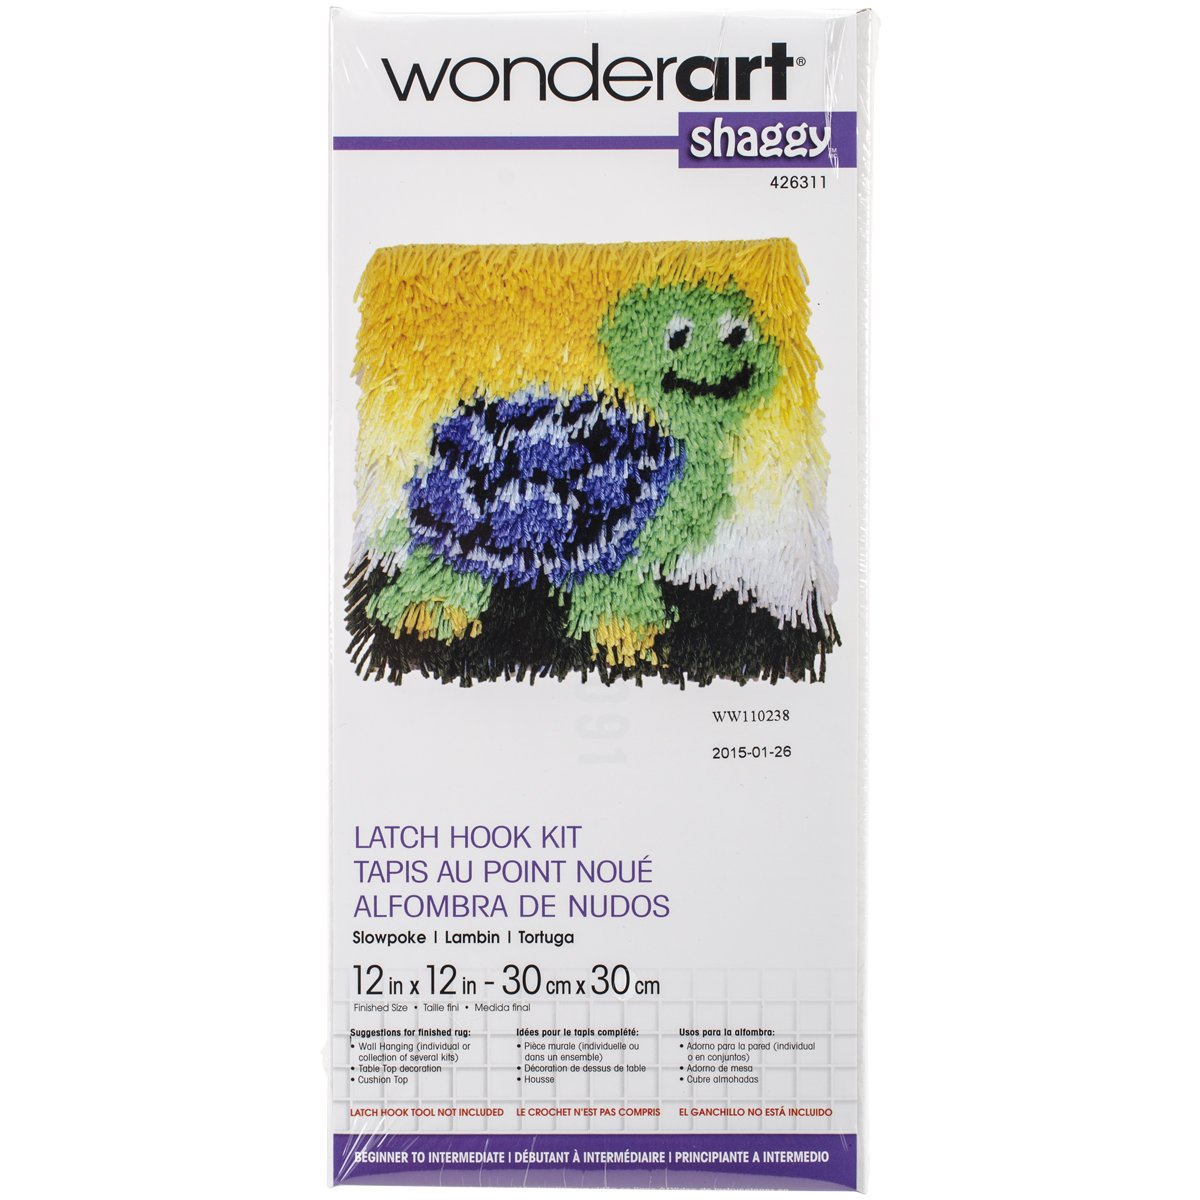 WonderArt 426311C Shaggy Latch Hook Kit 12 X 12 Slowpoke